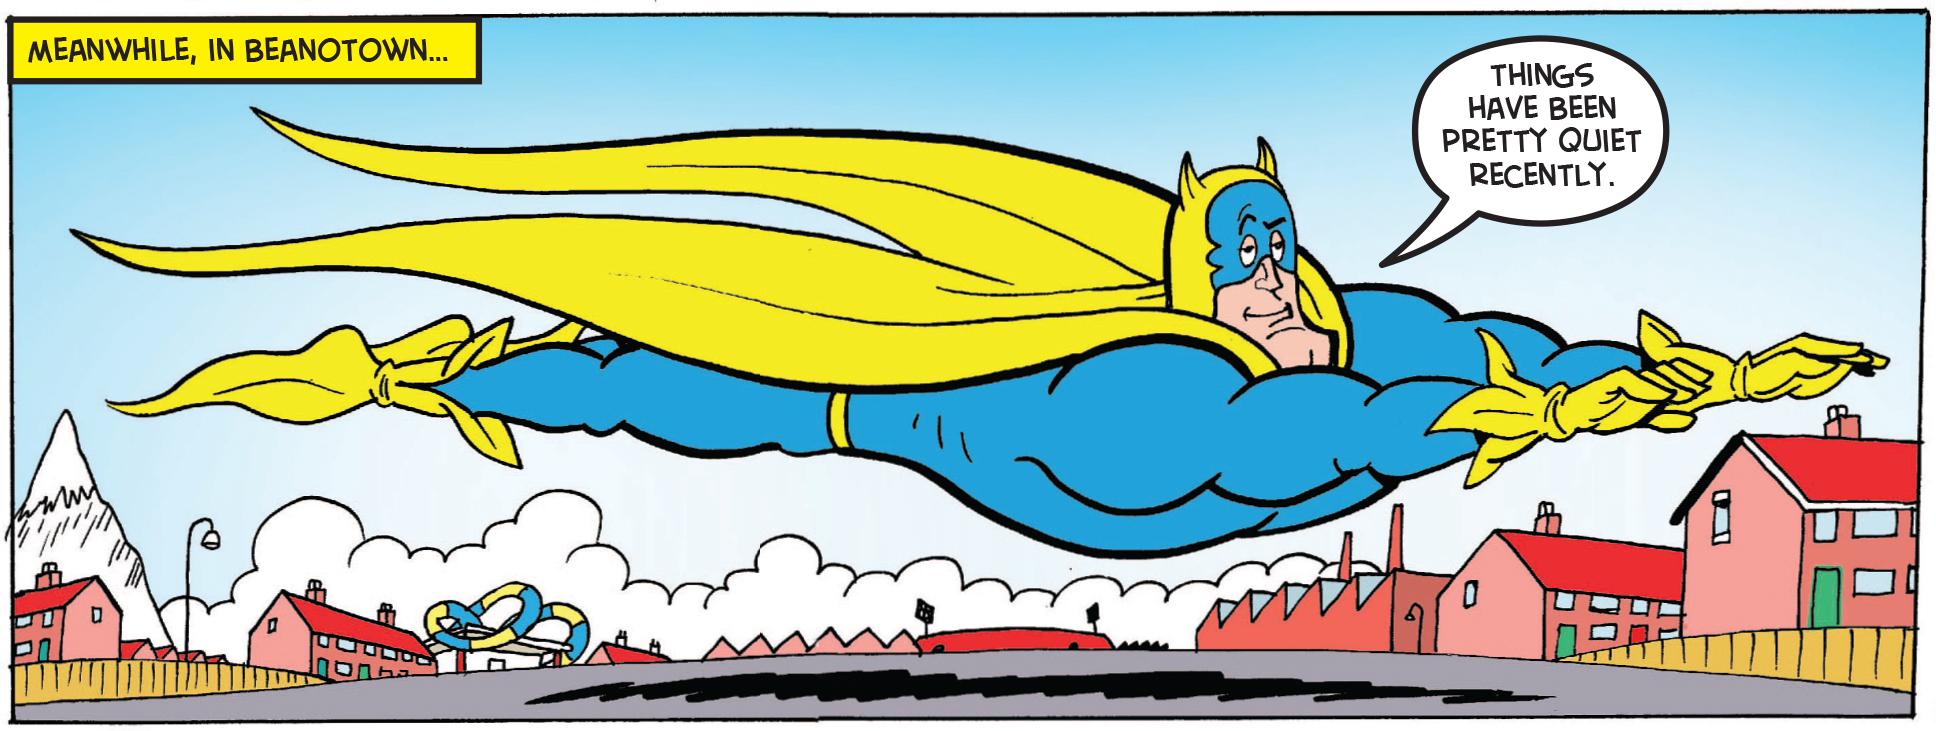 Bananaman flying